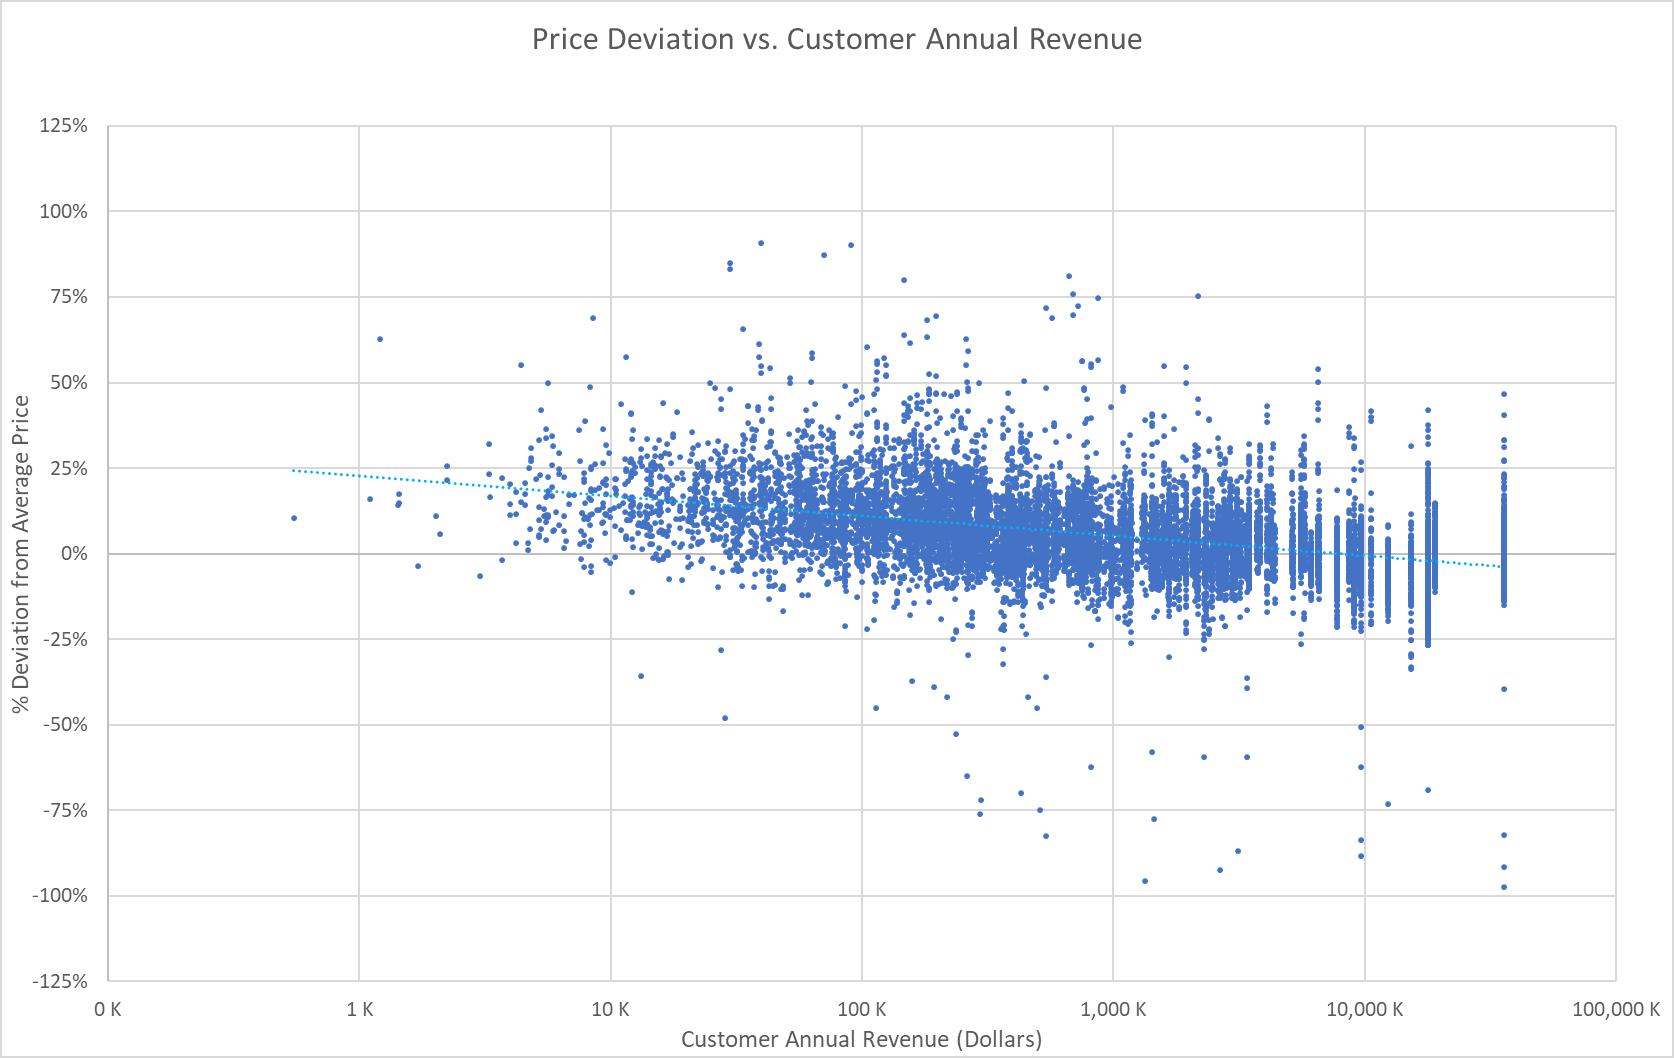 Pricing Analytics: Price Deviation vs. Customer Annual Revenue